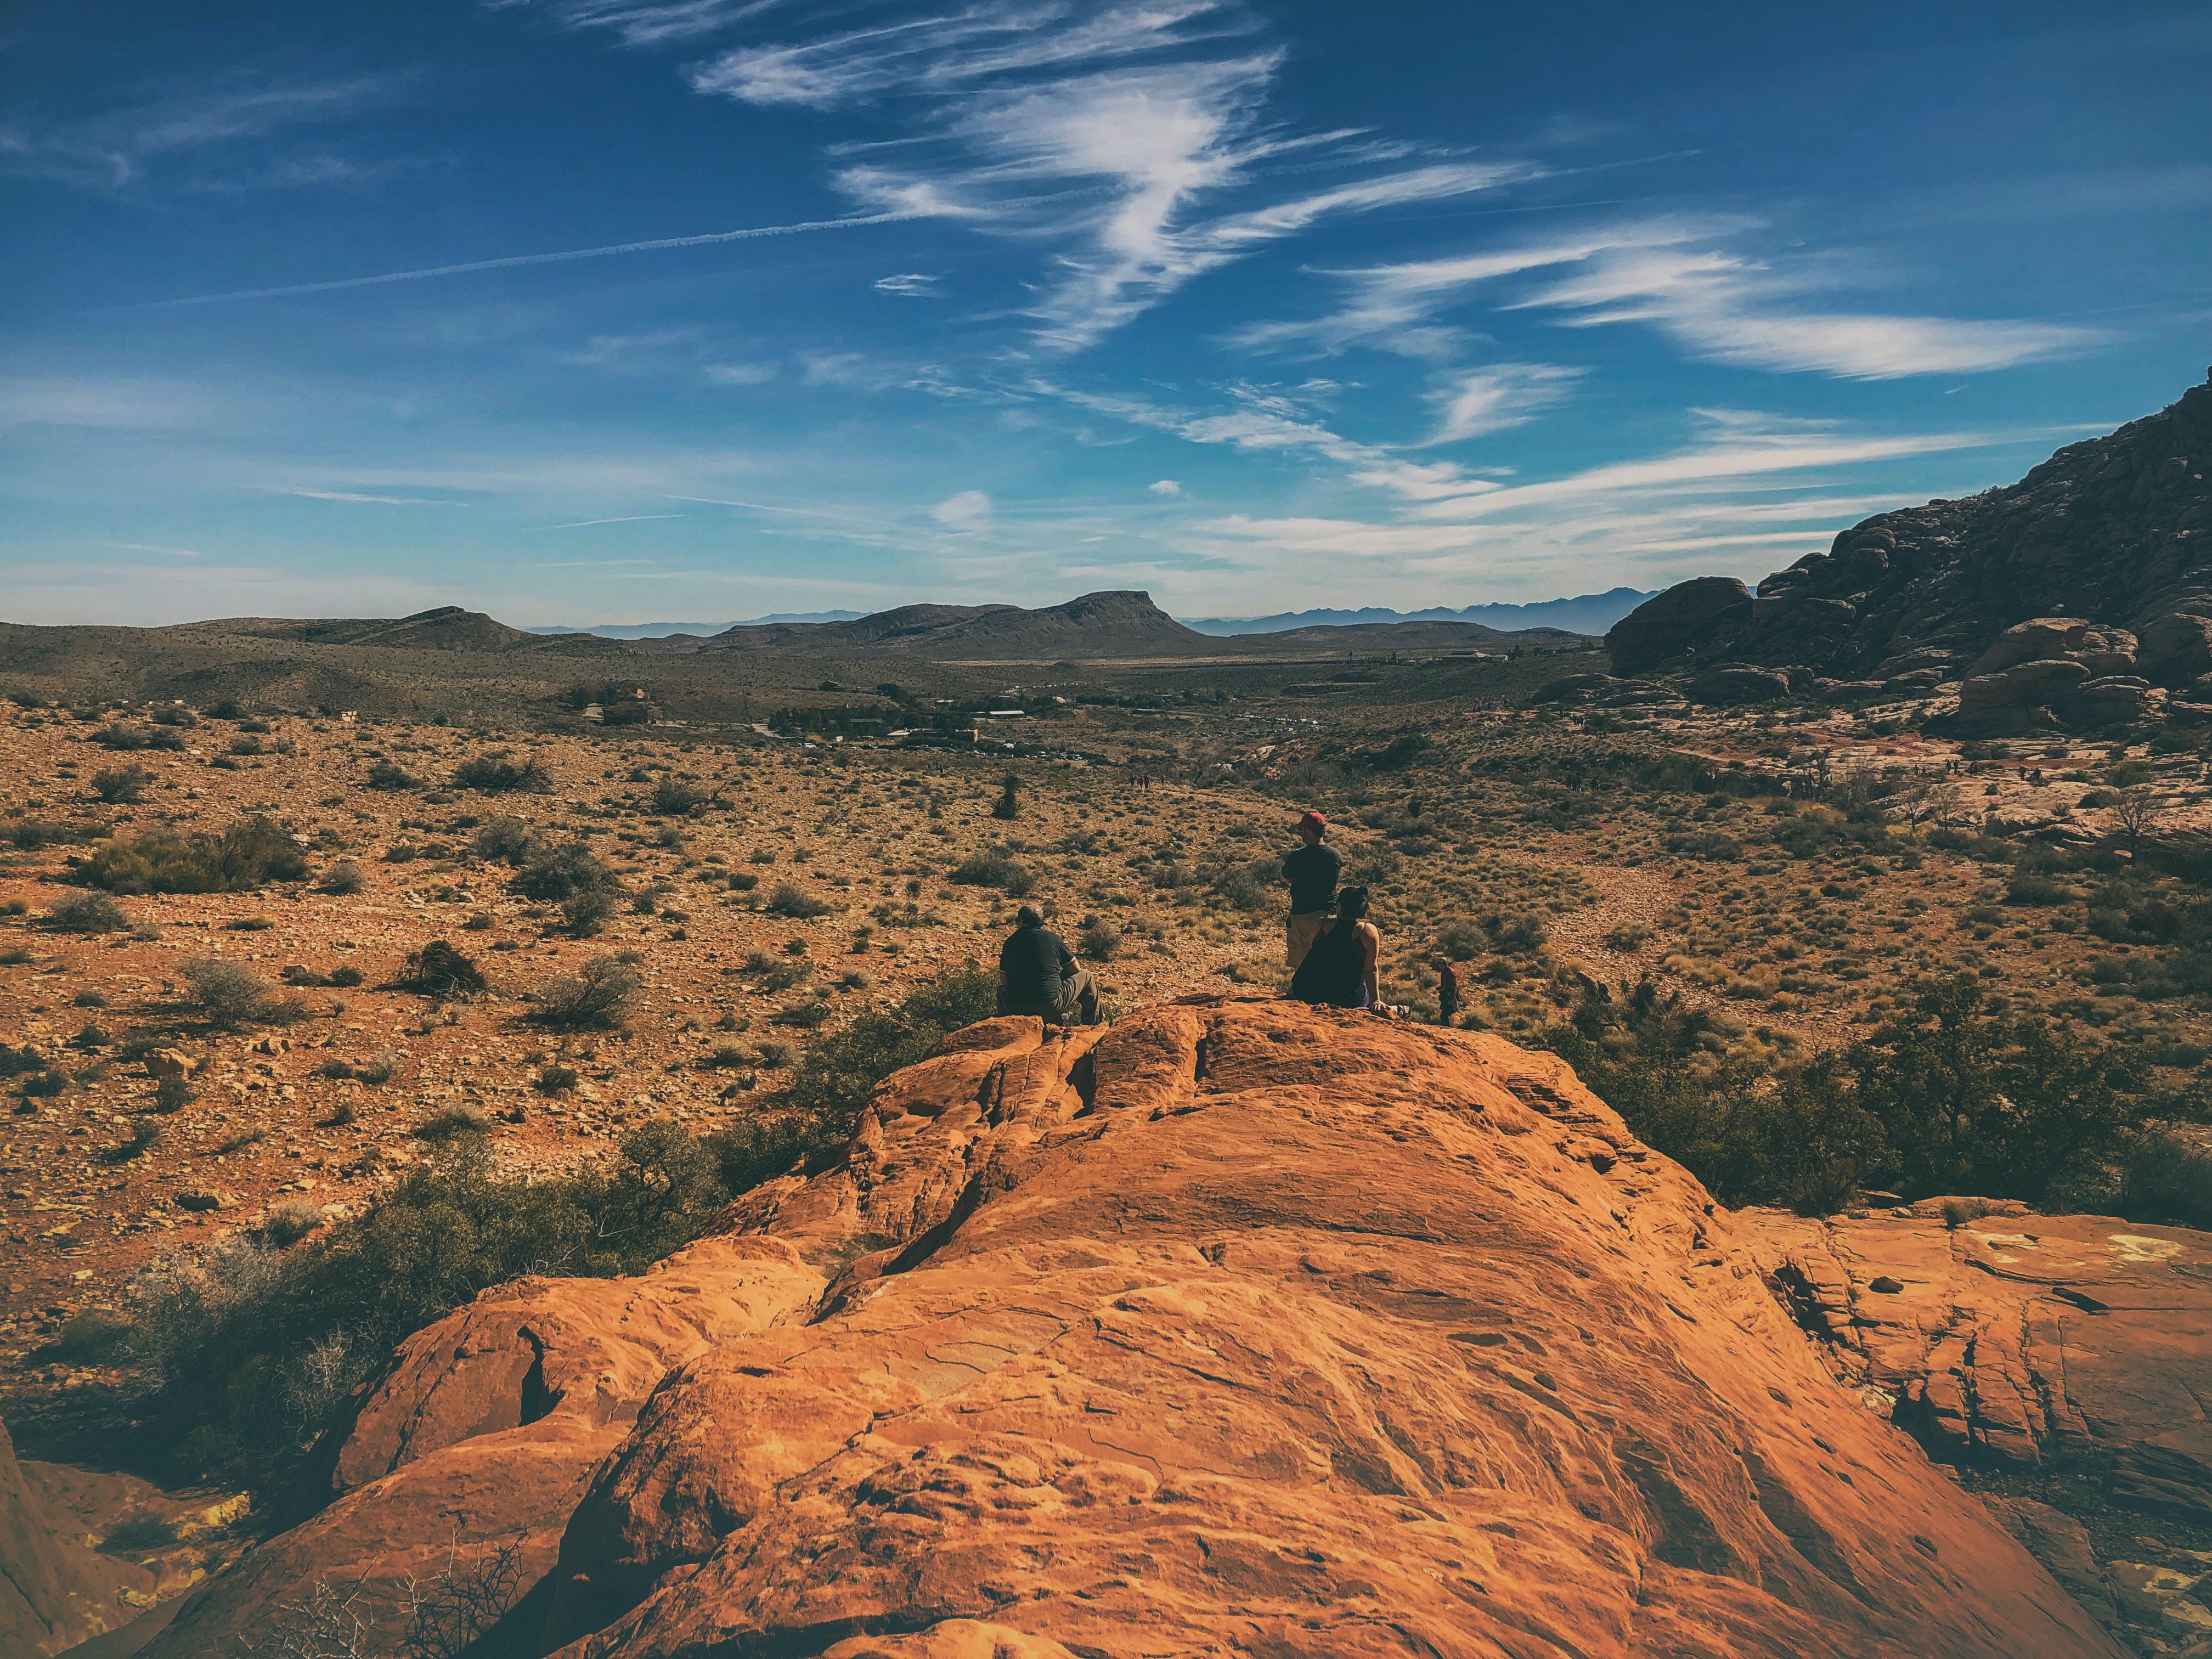 three men standing on rock formation